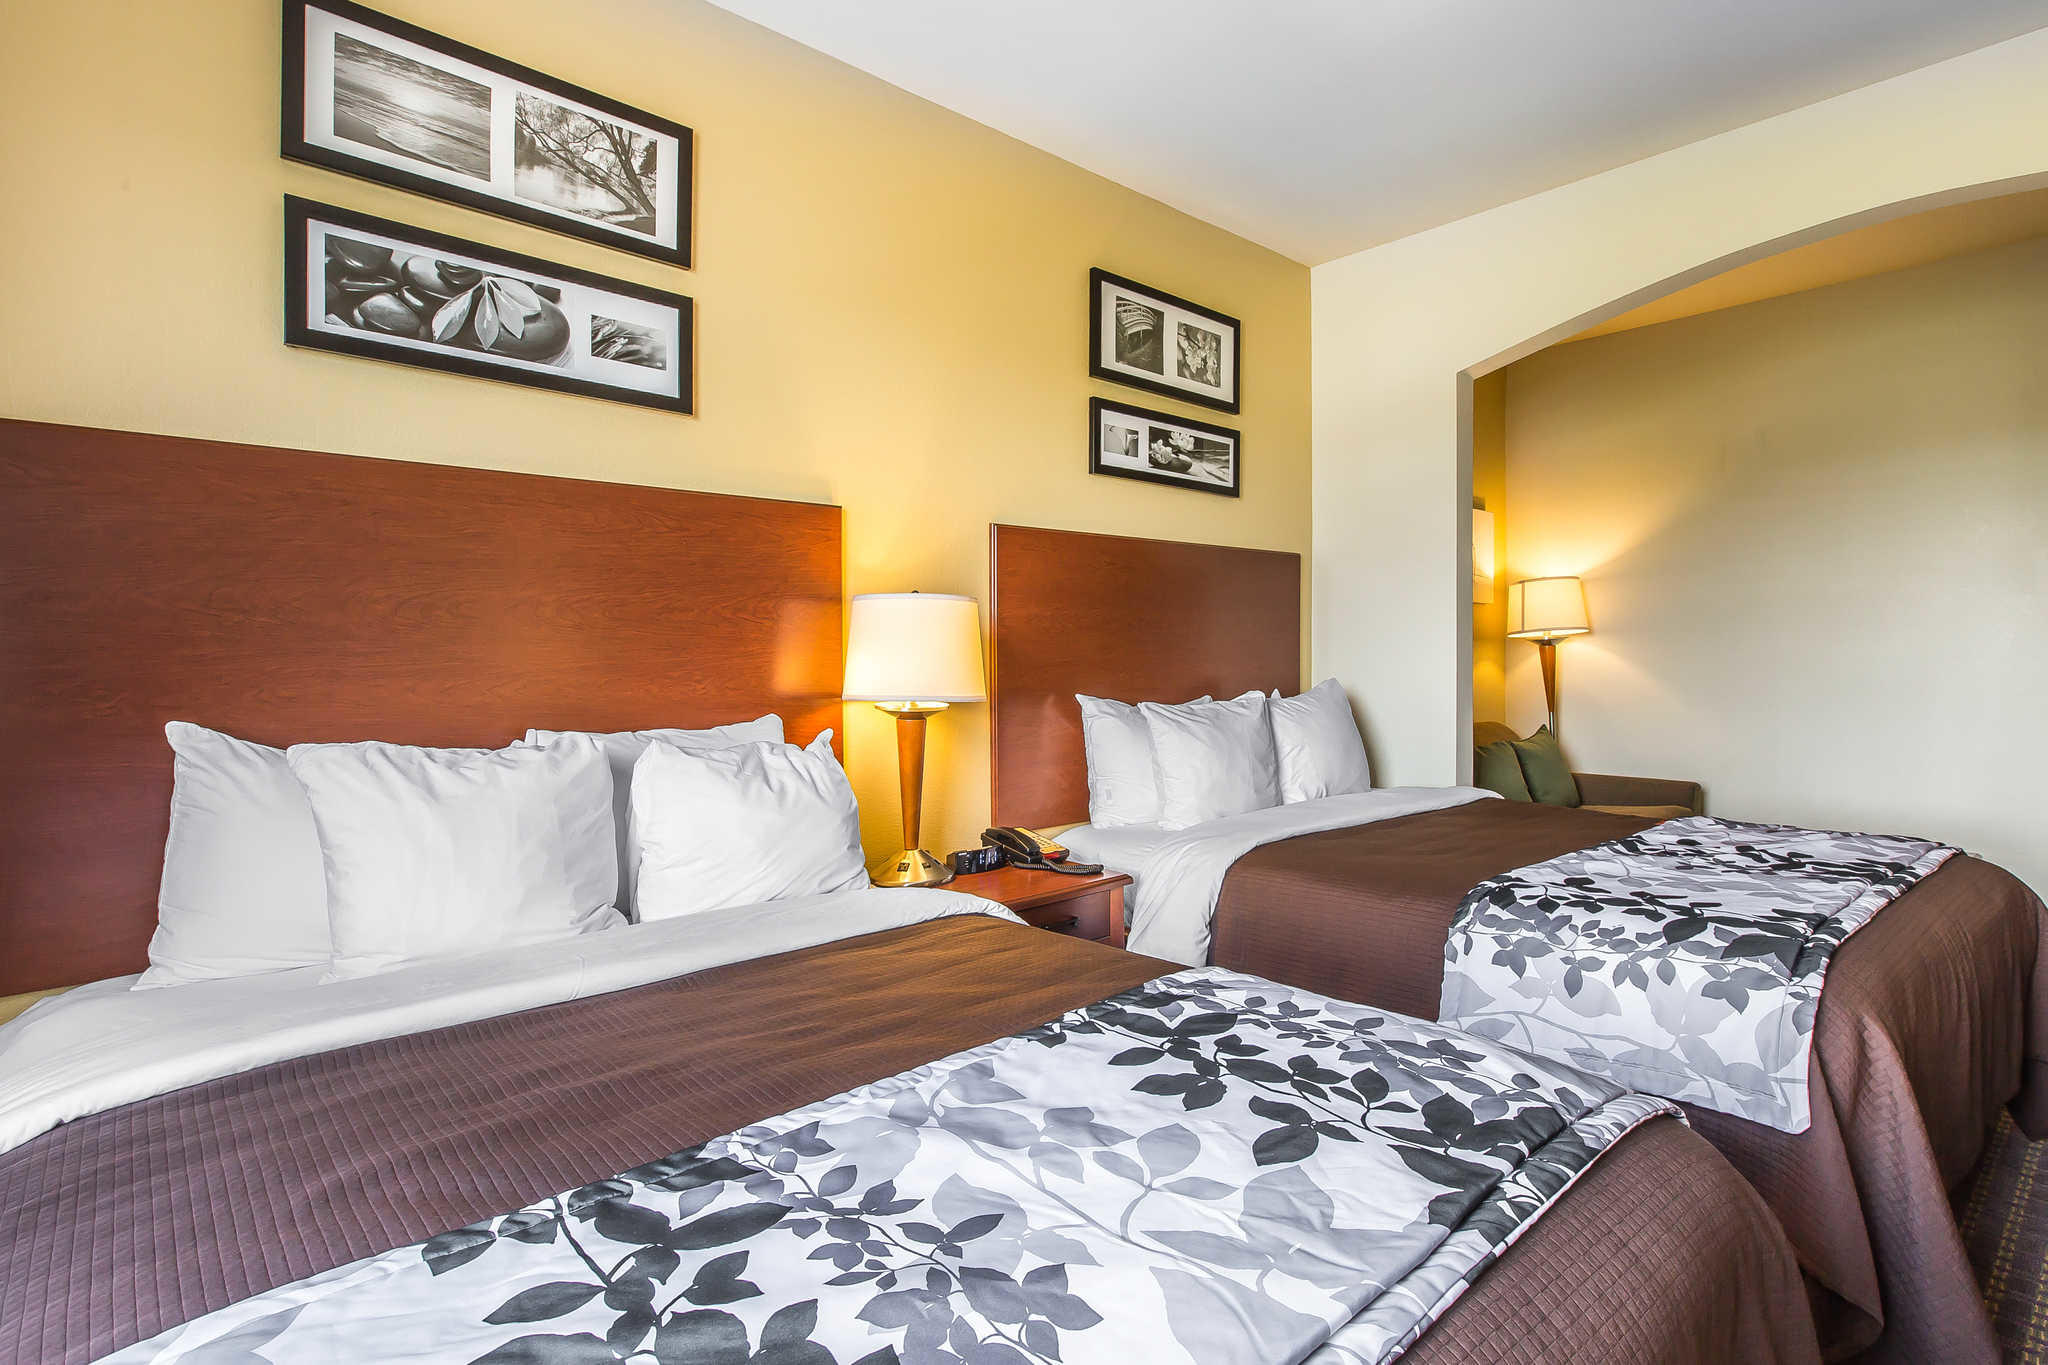 Sleep Inn & Suites At Kennesaw State University image 21